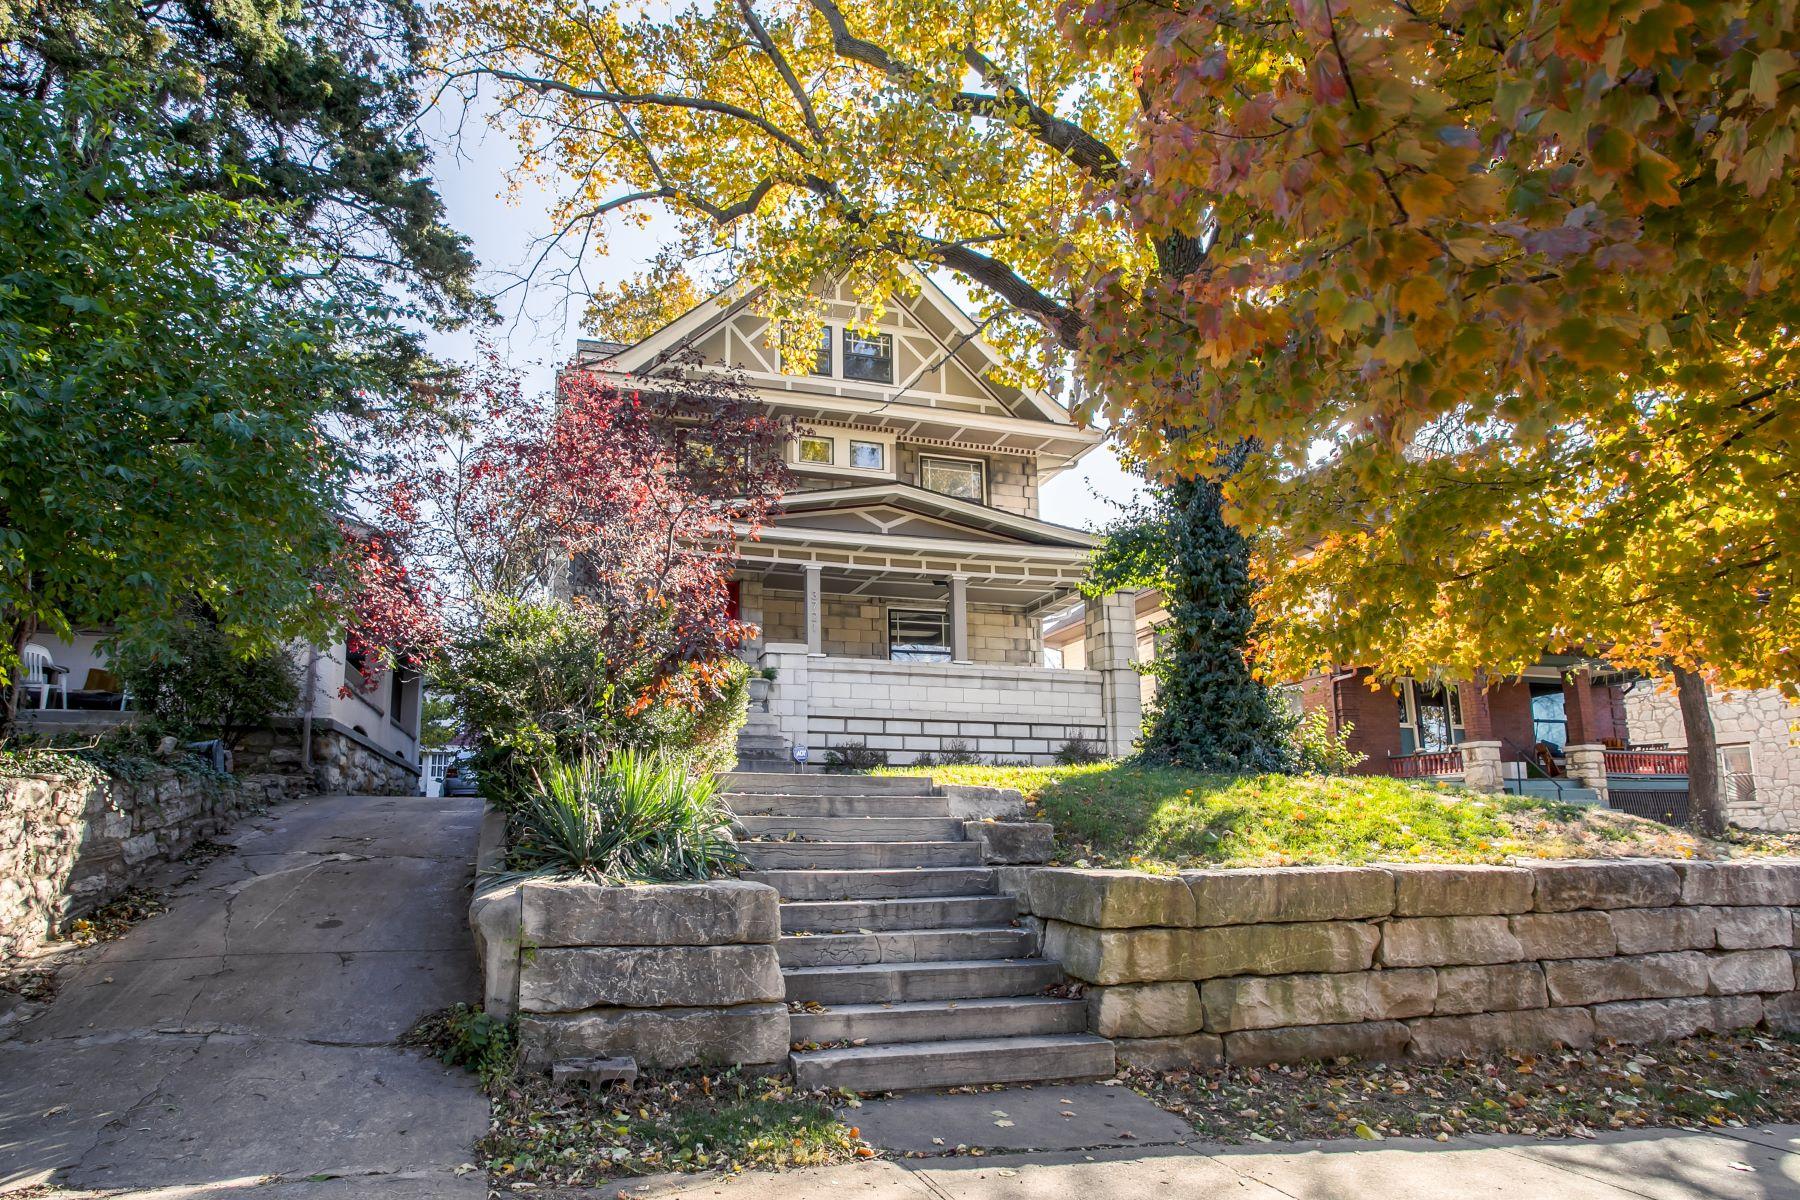 Single Family Homes for Active at In the heart of historic Valentine neighborhood 3721 Pennsylvania Avenue Kansas City, Missouri 64111 United States